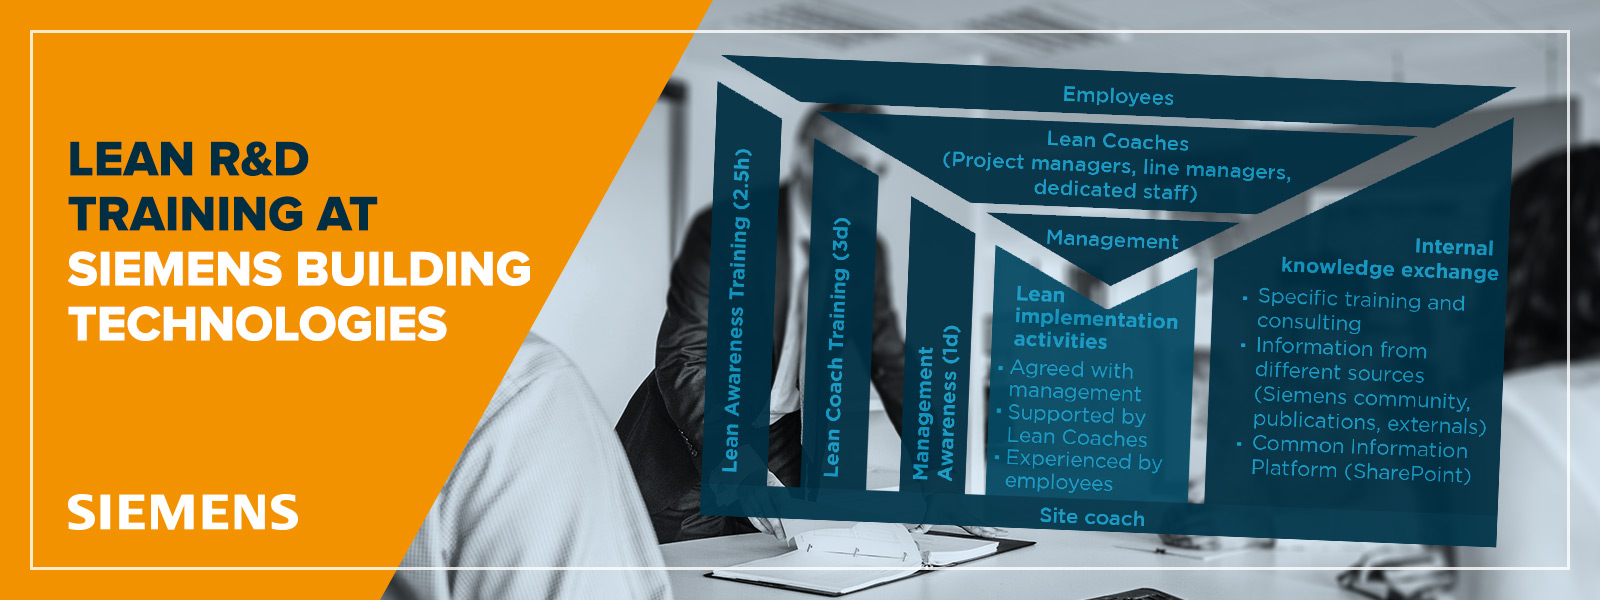 LAA-Blog---1.8.3-Siemens-Lean-training